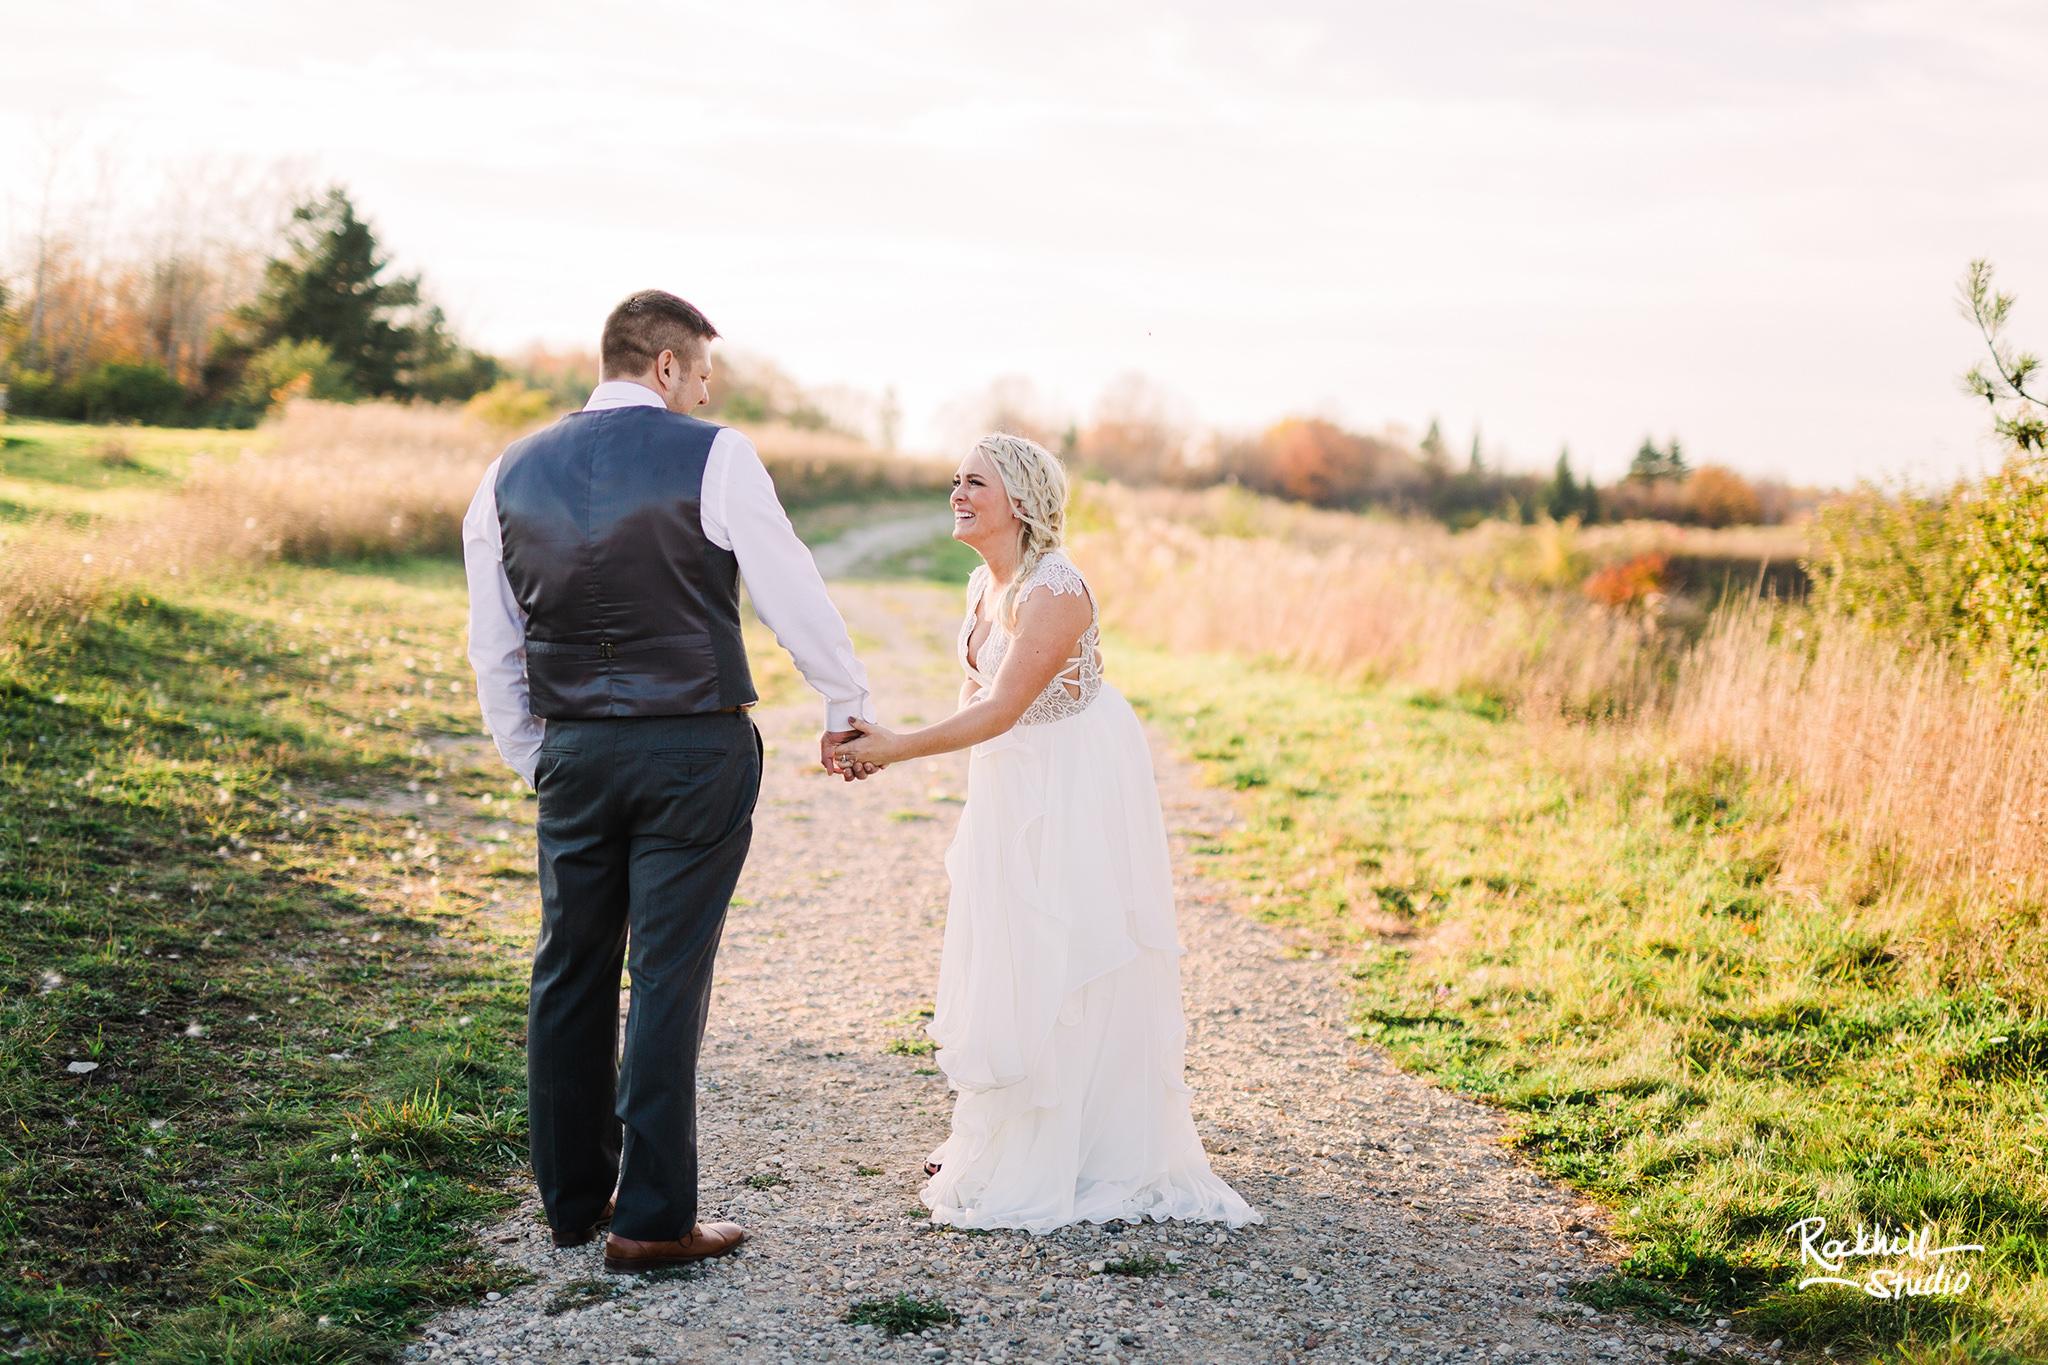 Rockhill Studio Traverse City And Northern Michigan Wedding